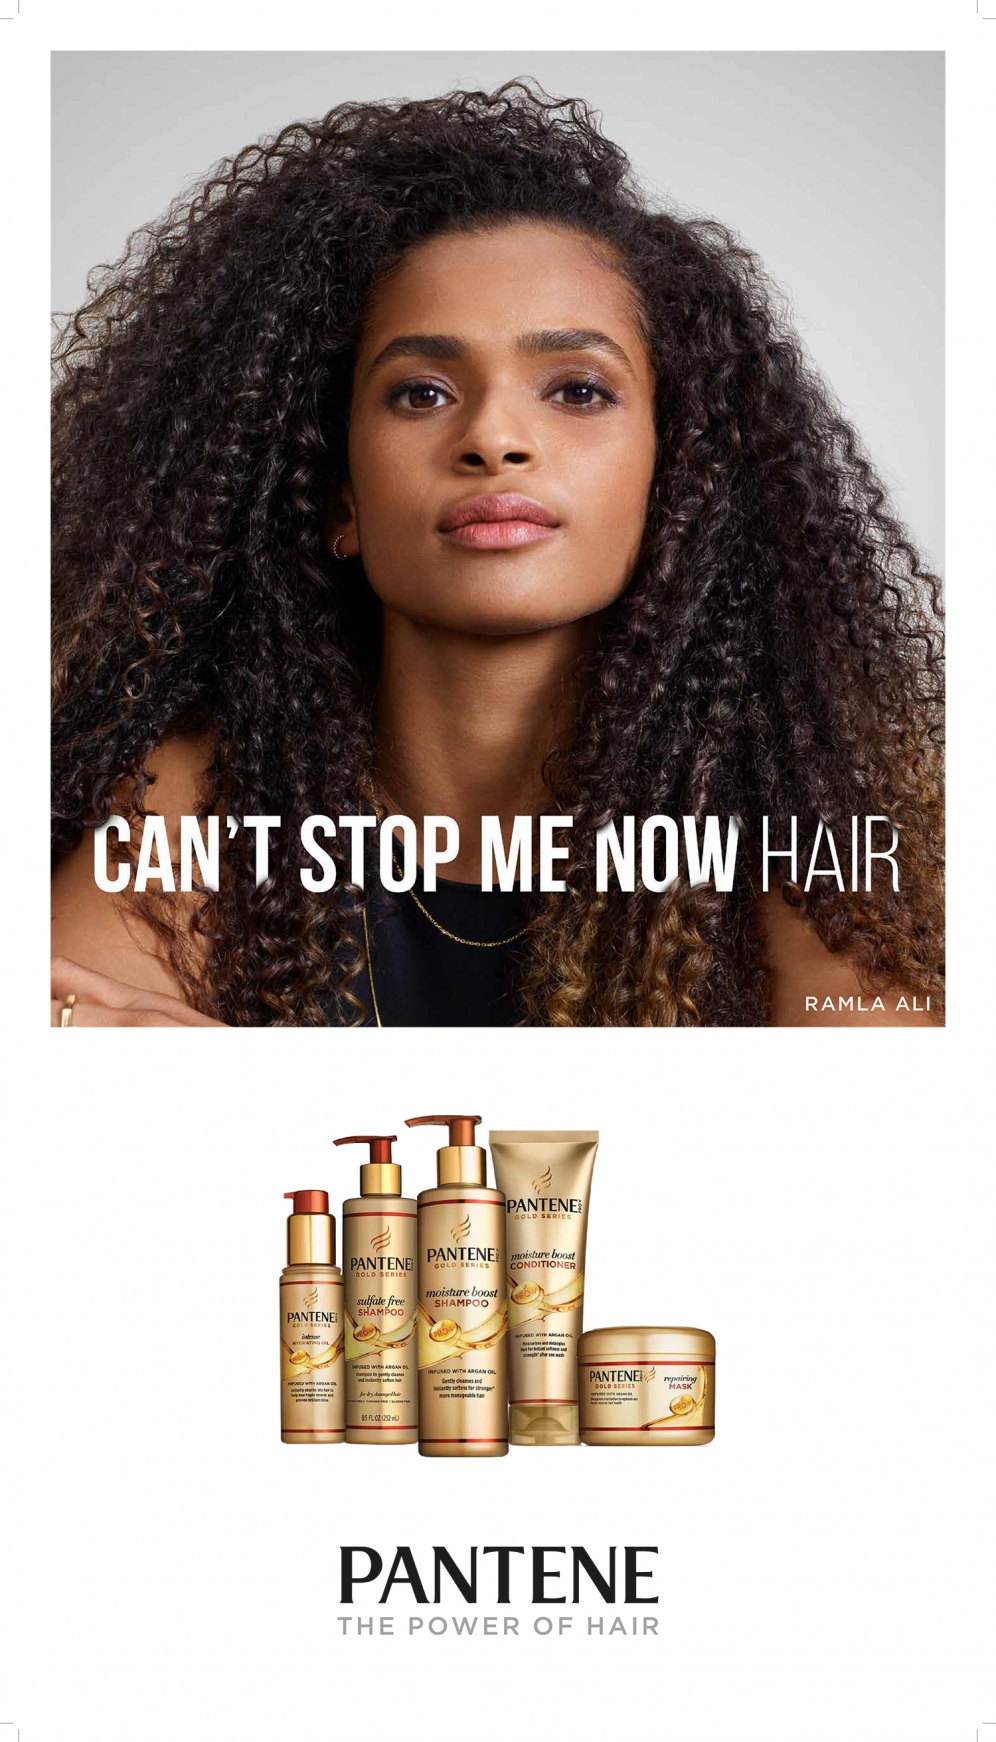 The Power of Hair | Pantene